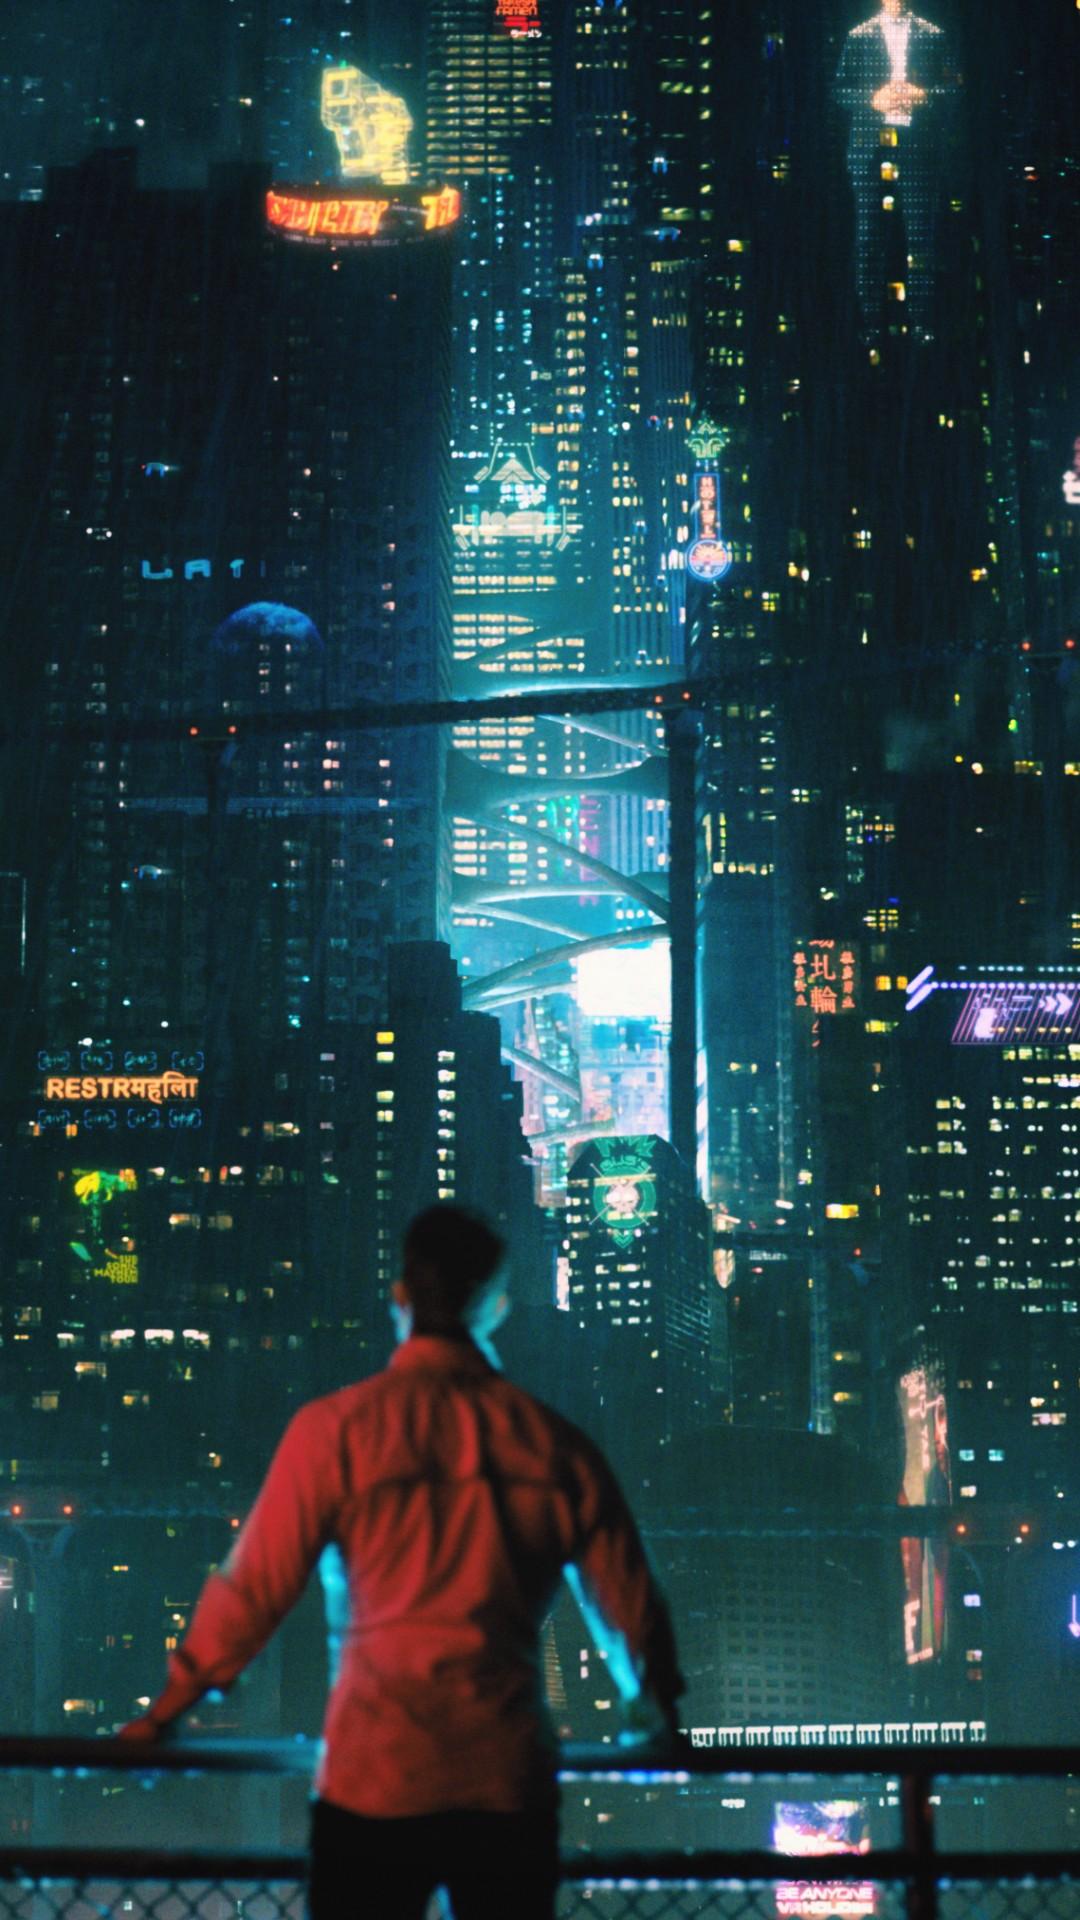 Wallpaper Futuristic Cyberpunk Future World 4k Art 20450